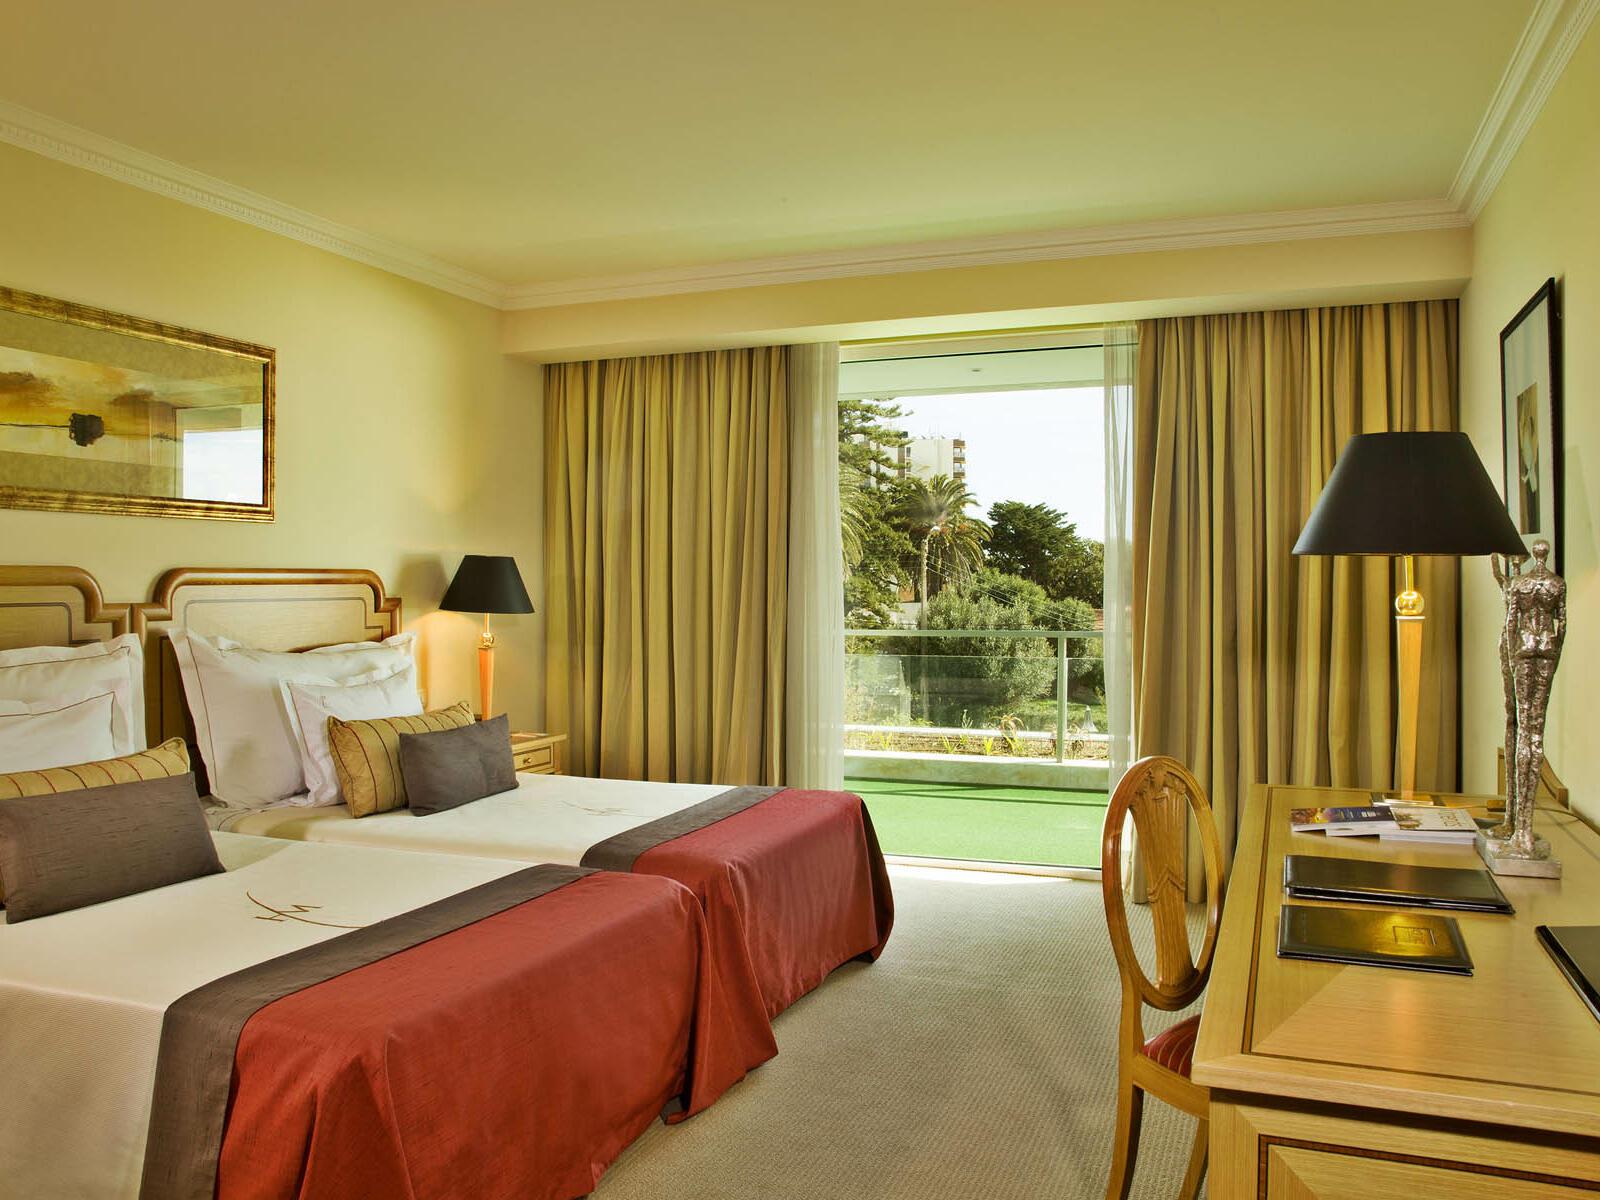 Suit with double beds at Hotel Cascais Miragem